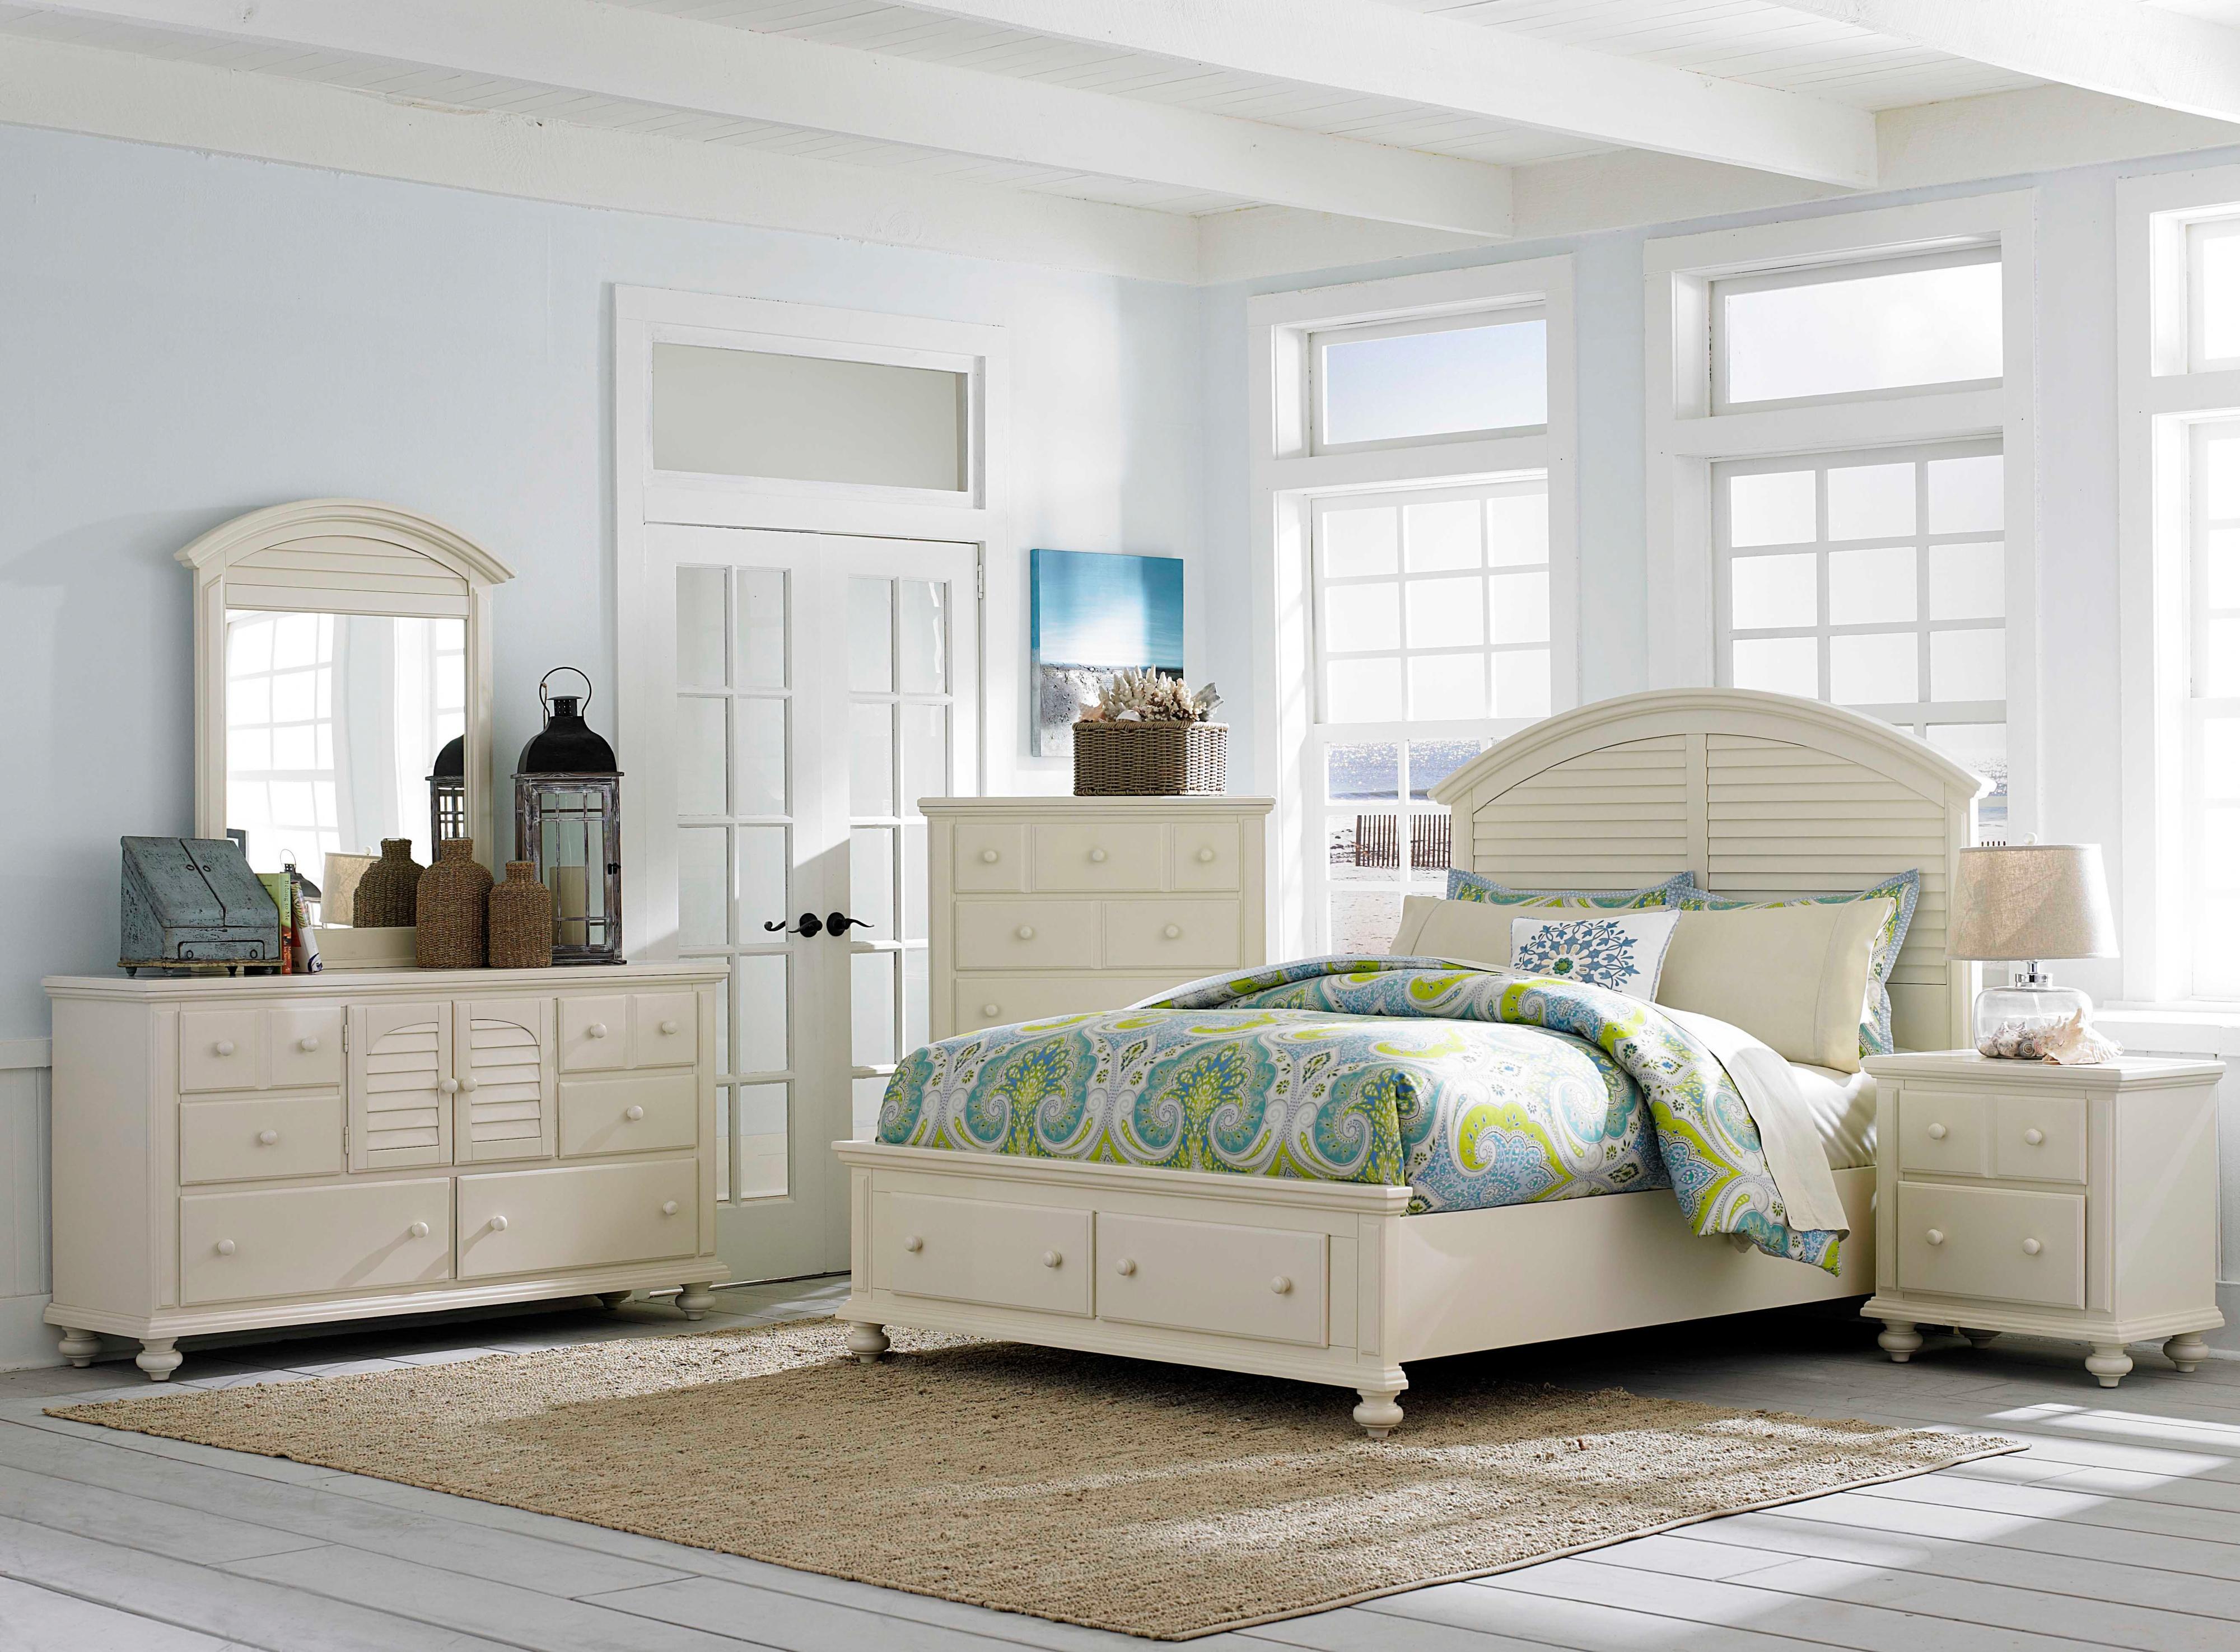 Seabrooke 4471 By Broyhill Furniture Baer 39 S Furniture